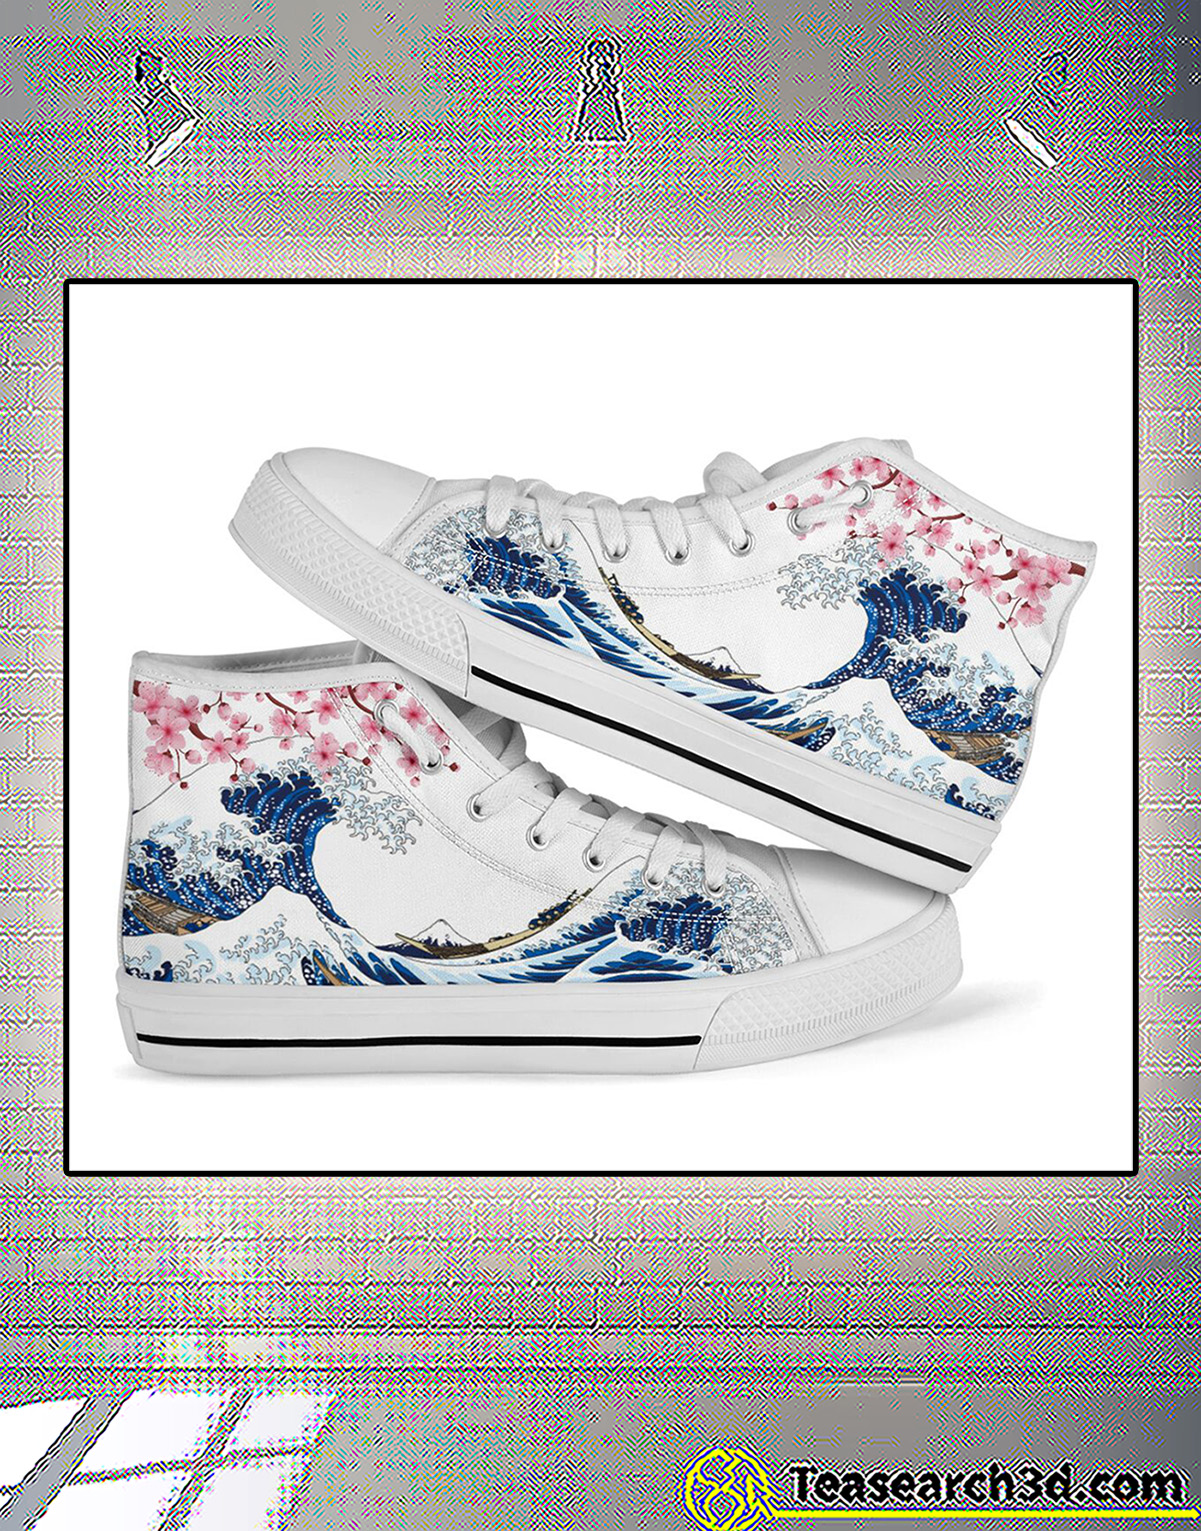 Kanagawa wave sakura cherry blossom japanese high top shoe